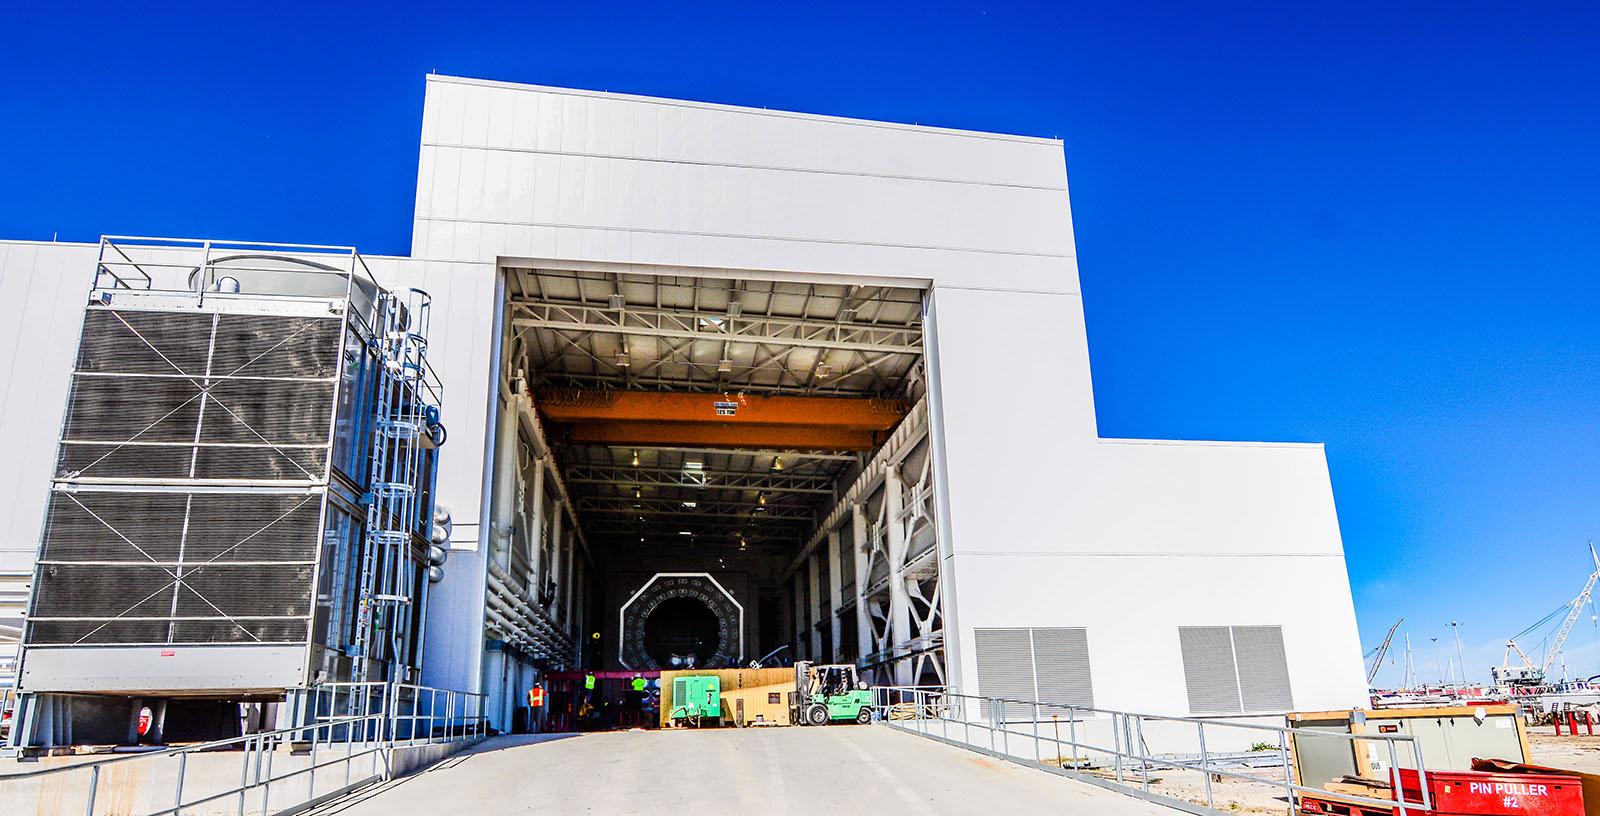 CLEMSON_Windturbine_drivetrain_test_facility_Test_Rig_USA_ADA_Idom__4_